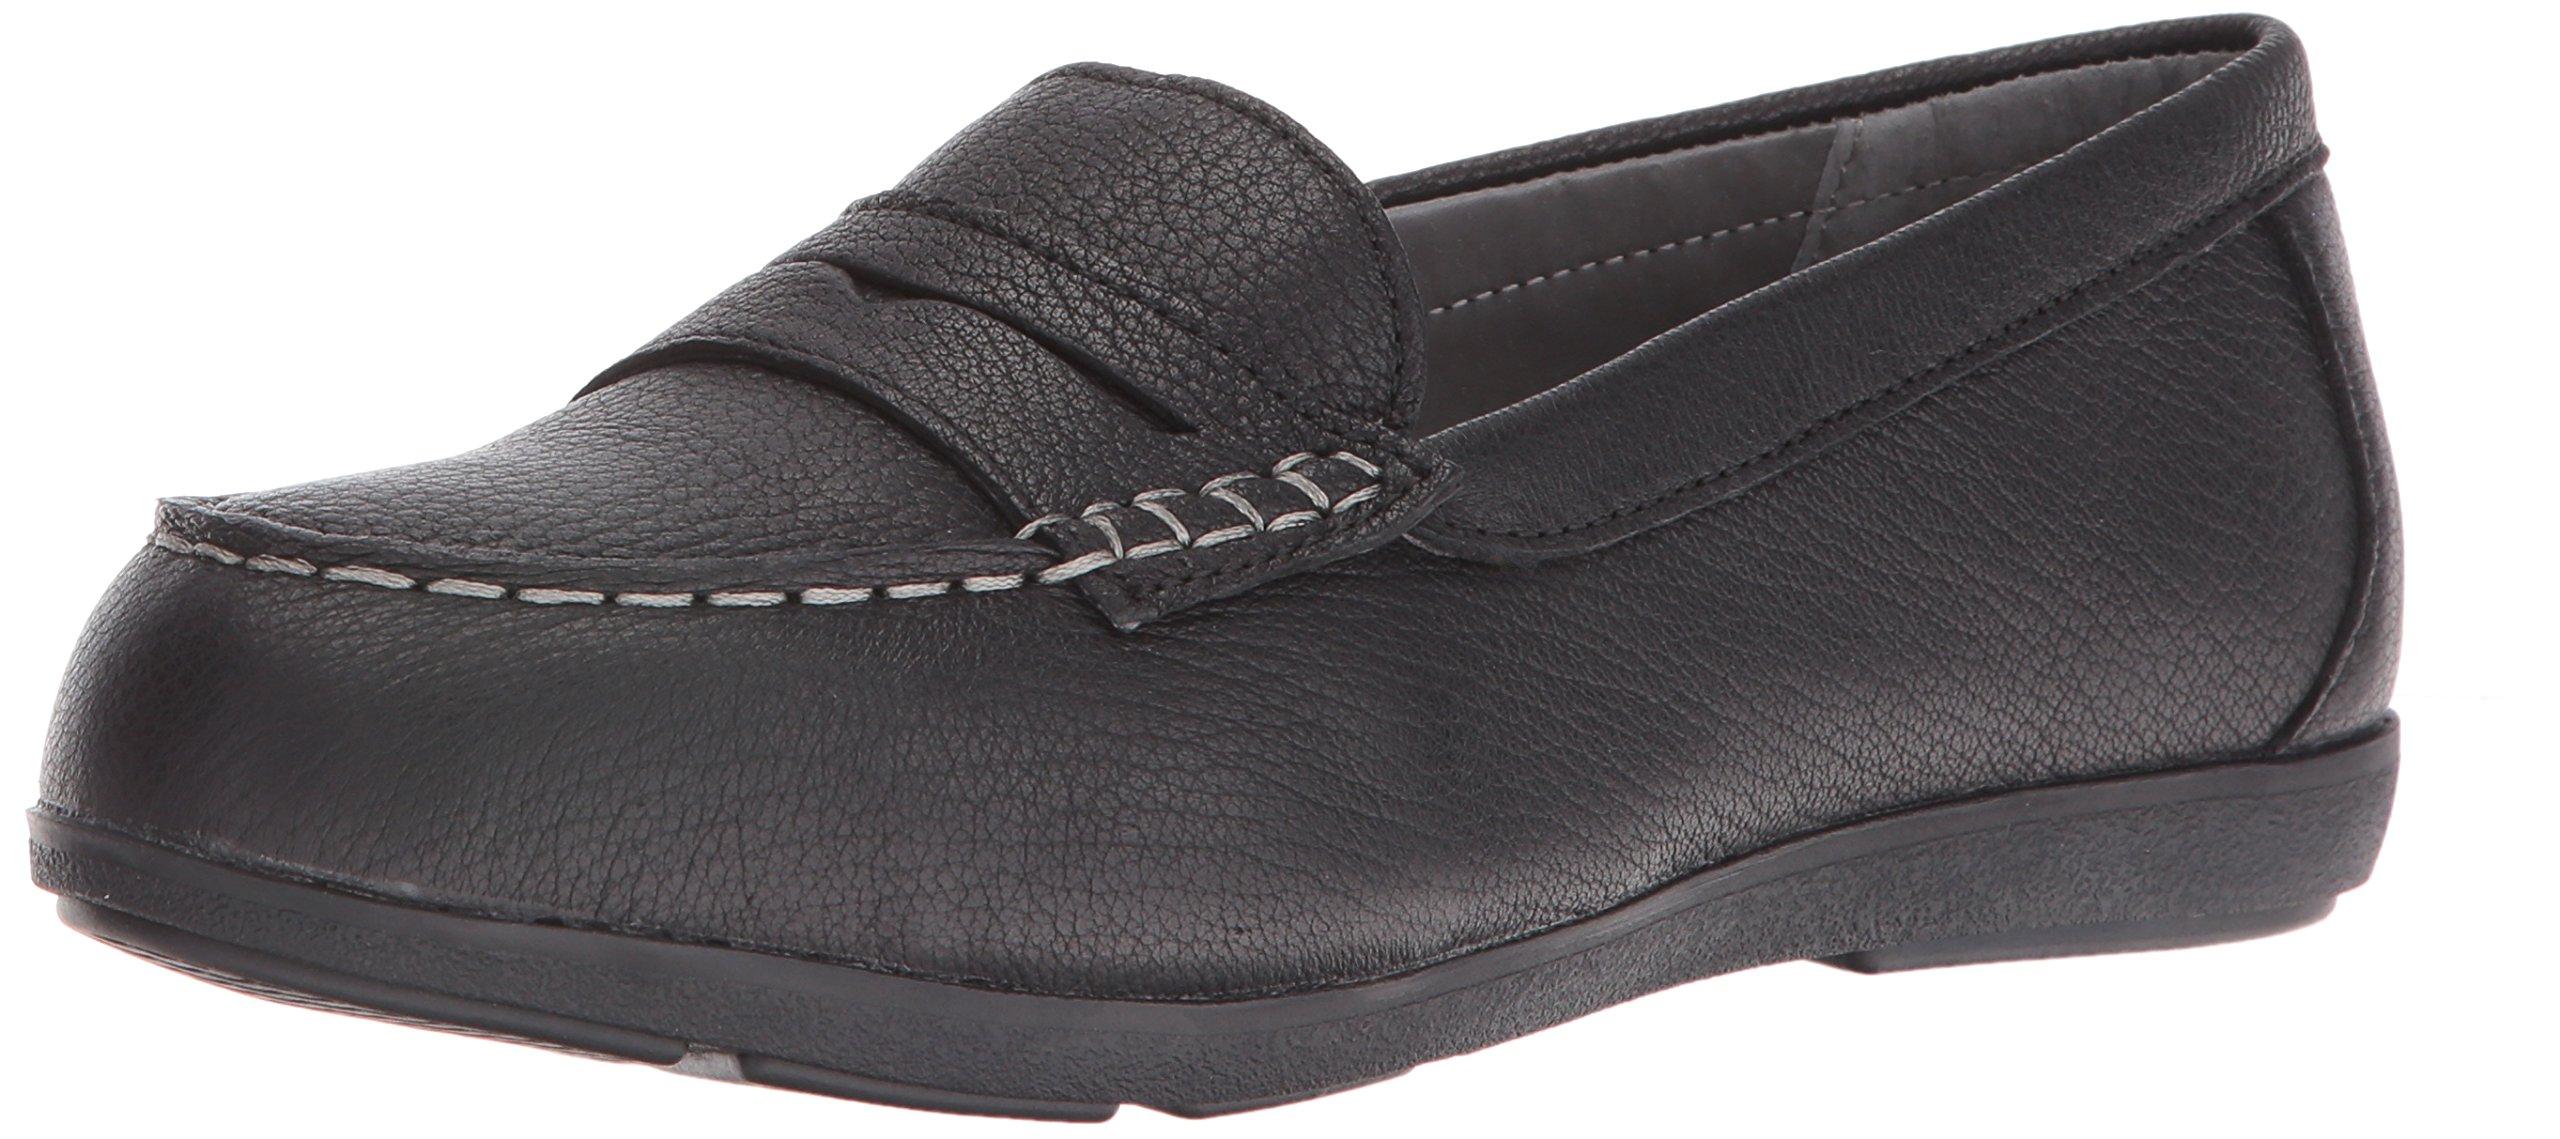 Rockport Work Women's Top Shore RK600 Work Shoe, Black, 8.5 M US